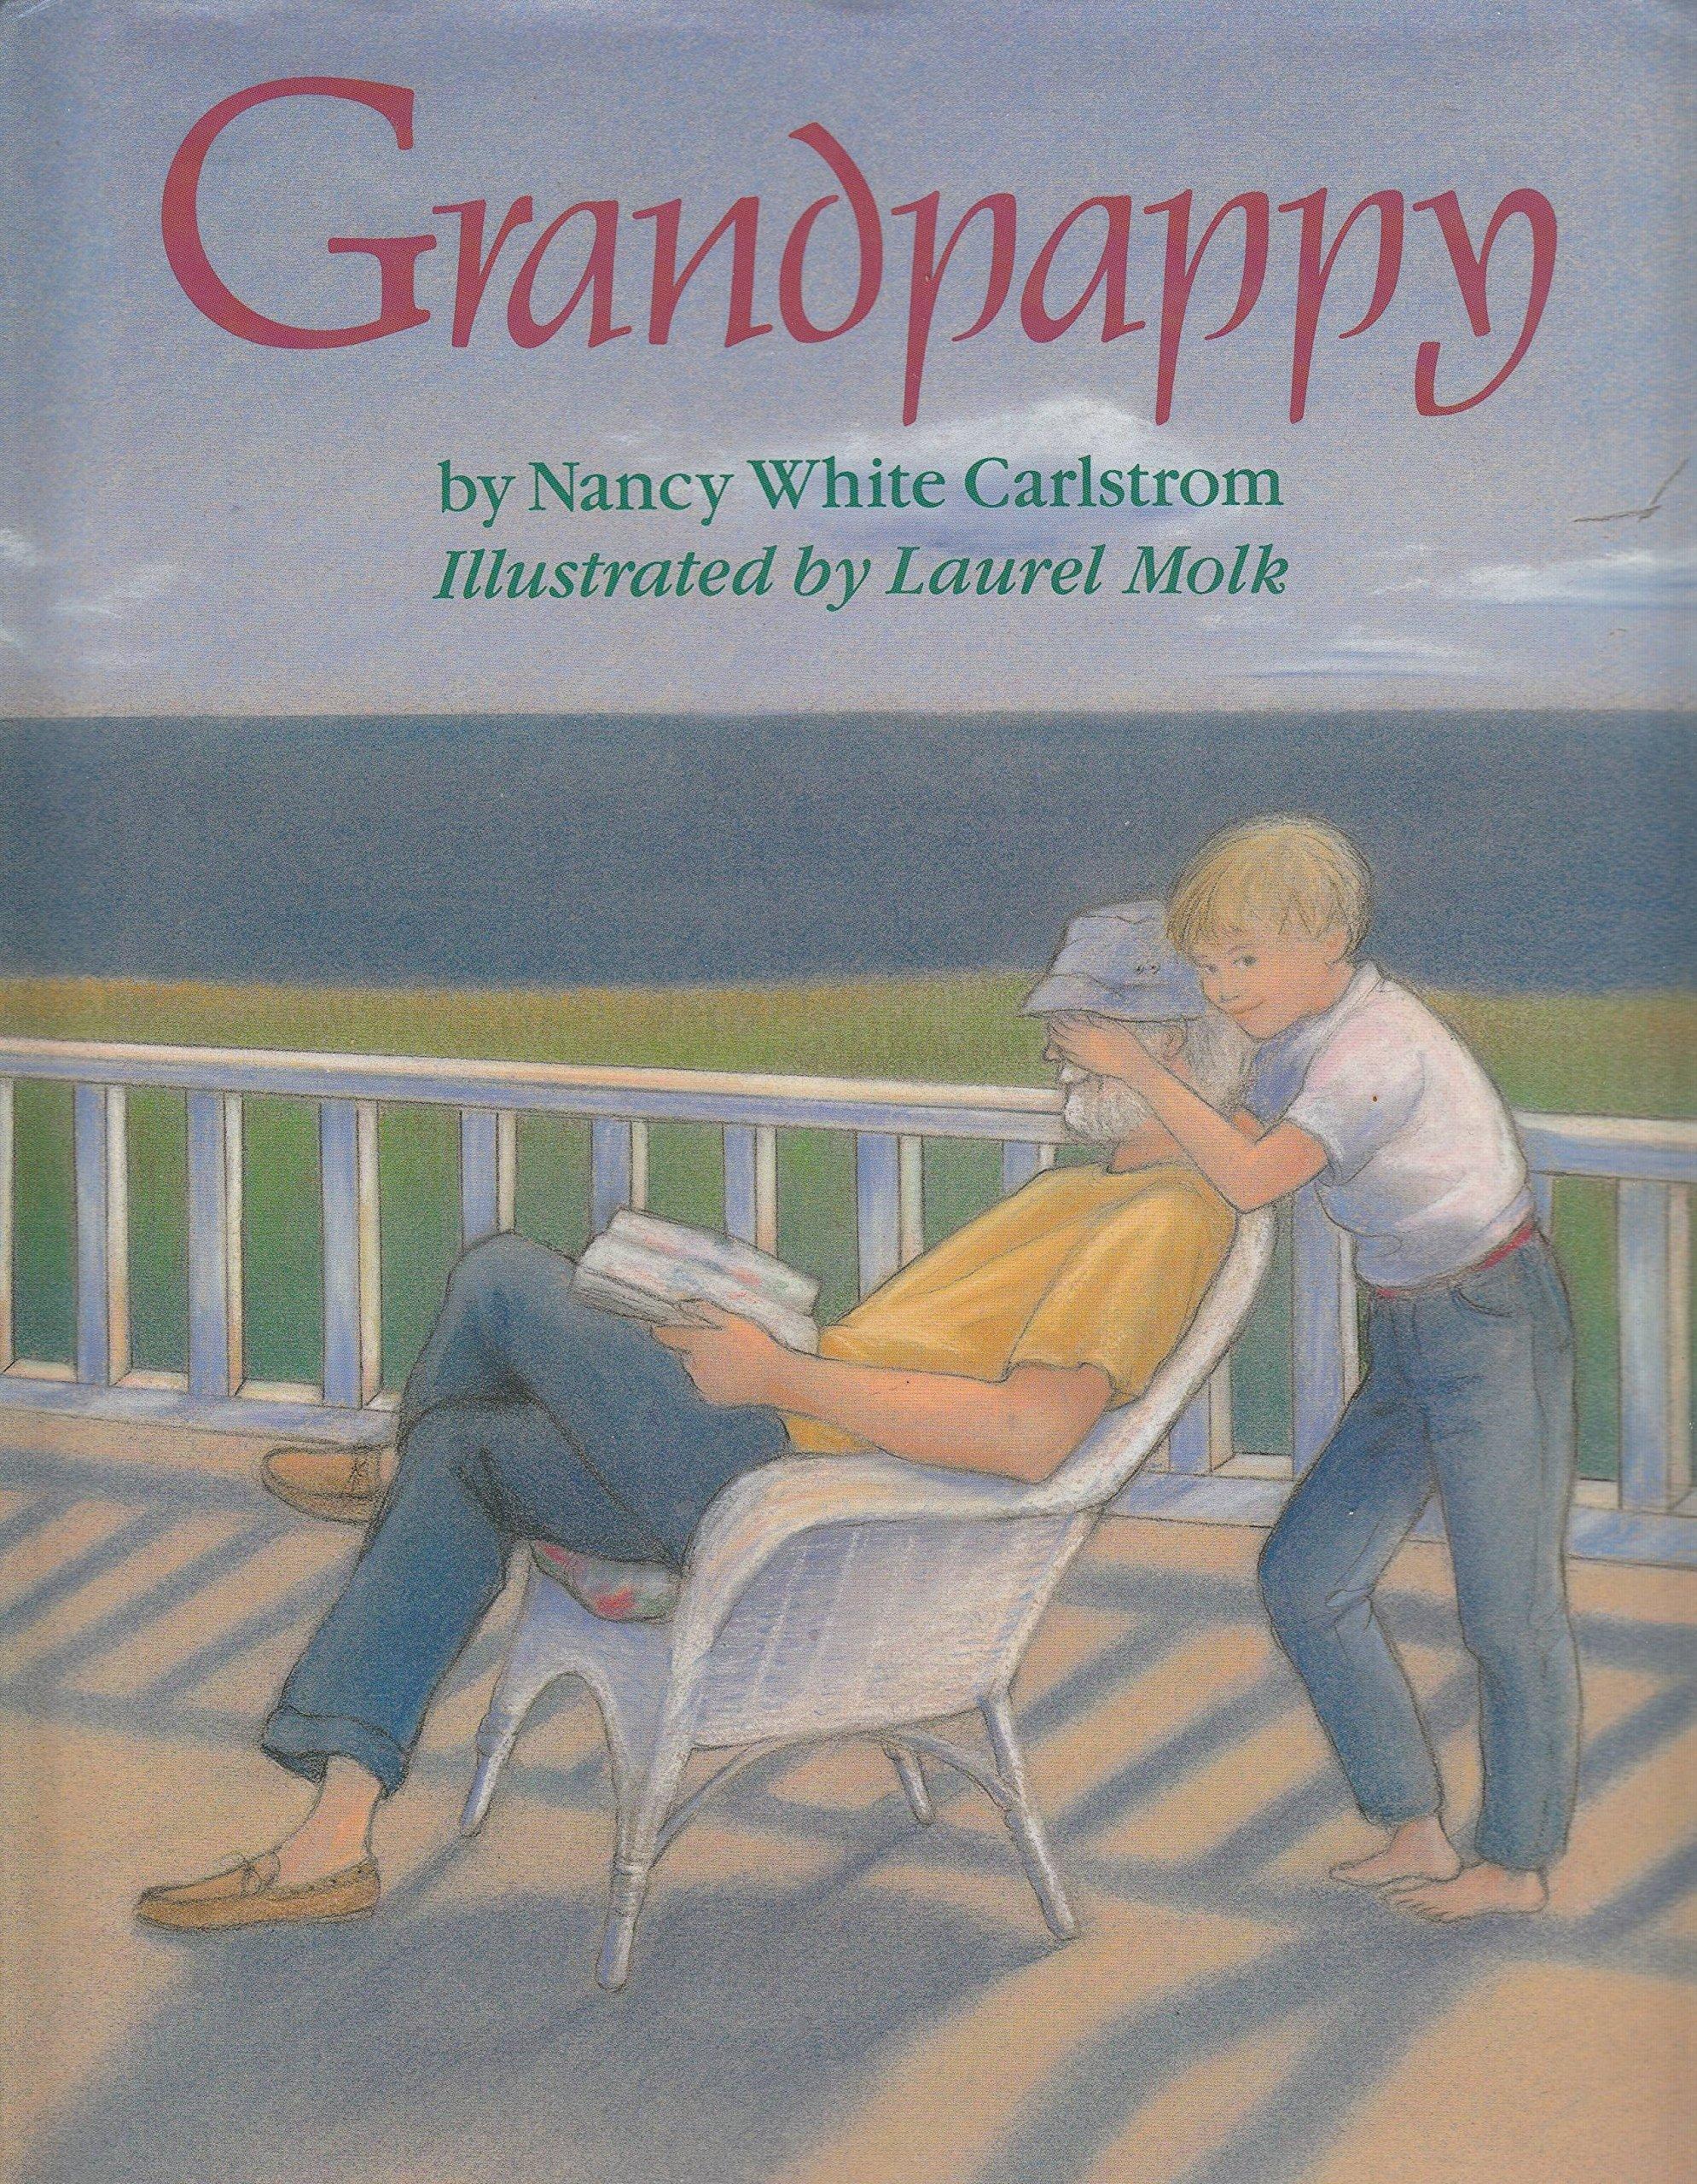 Grandpappy